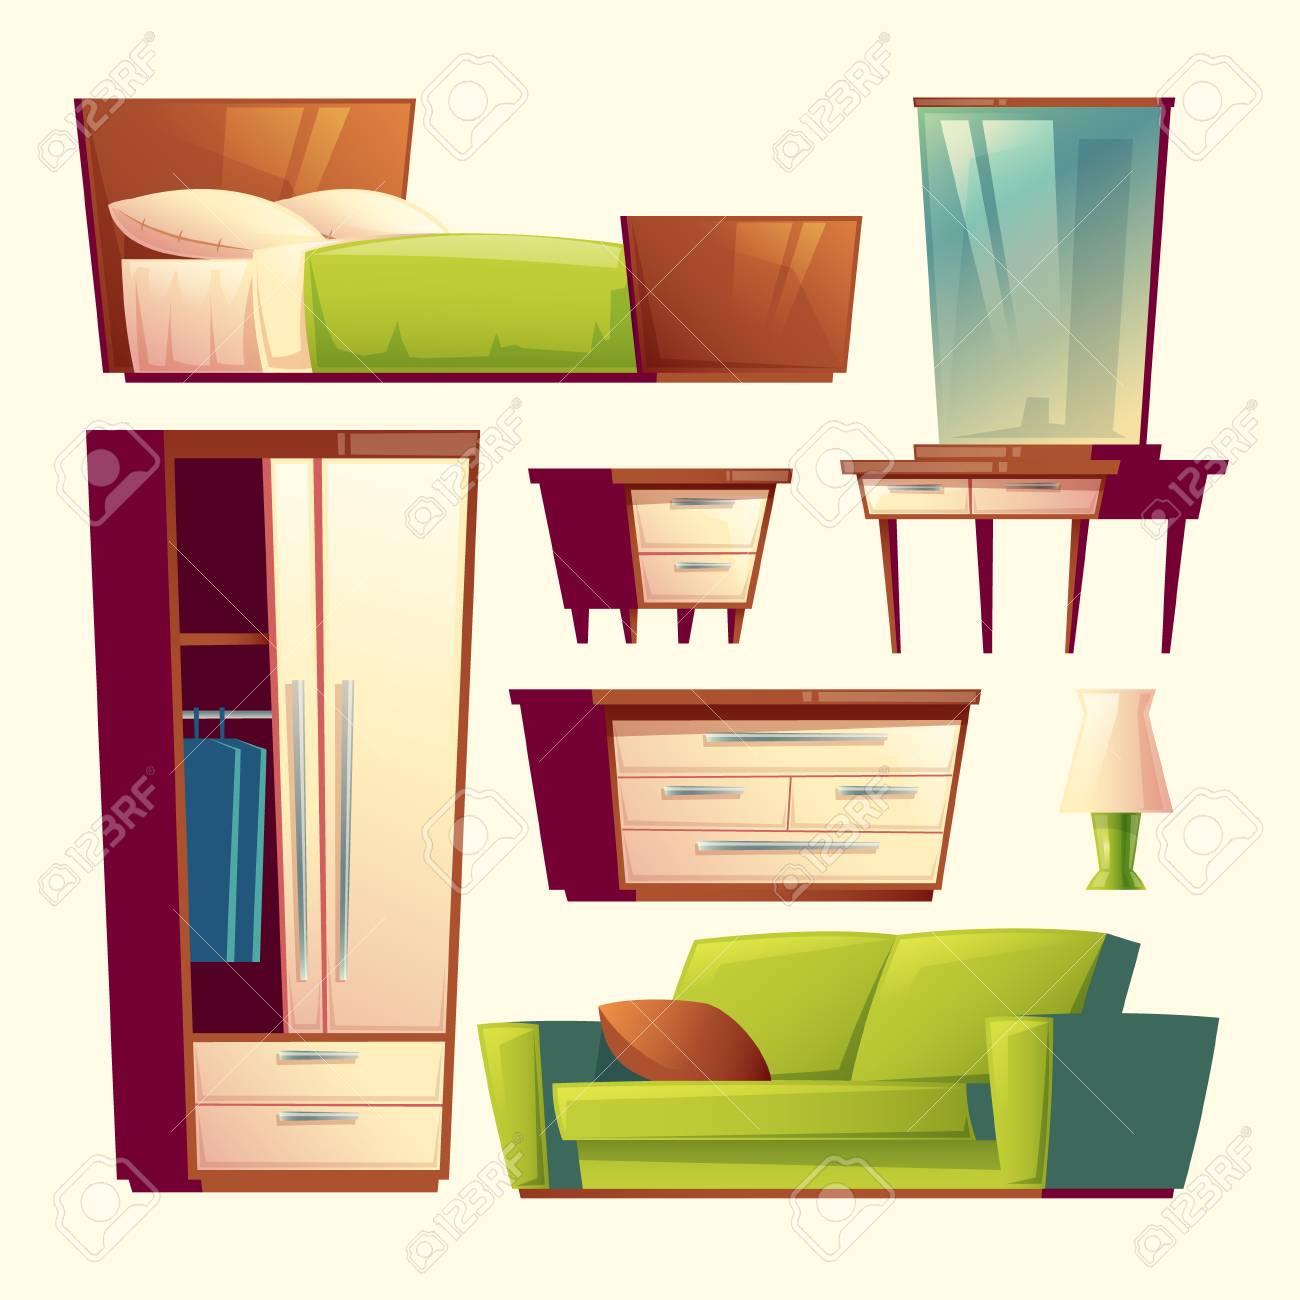 Bedroom Living Room Interior Furniture Cartoon Objects Set Stock